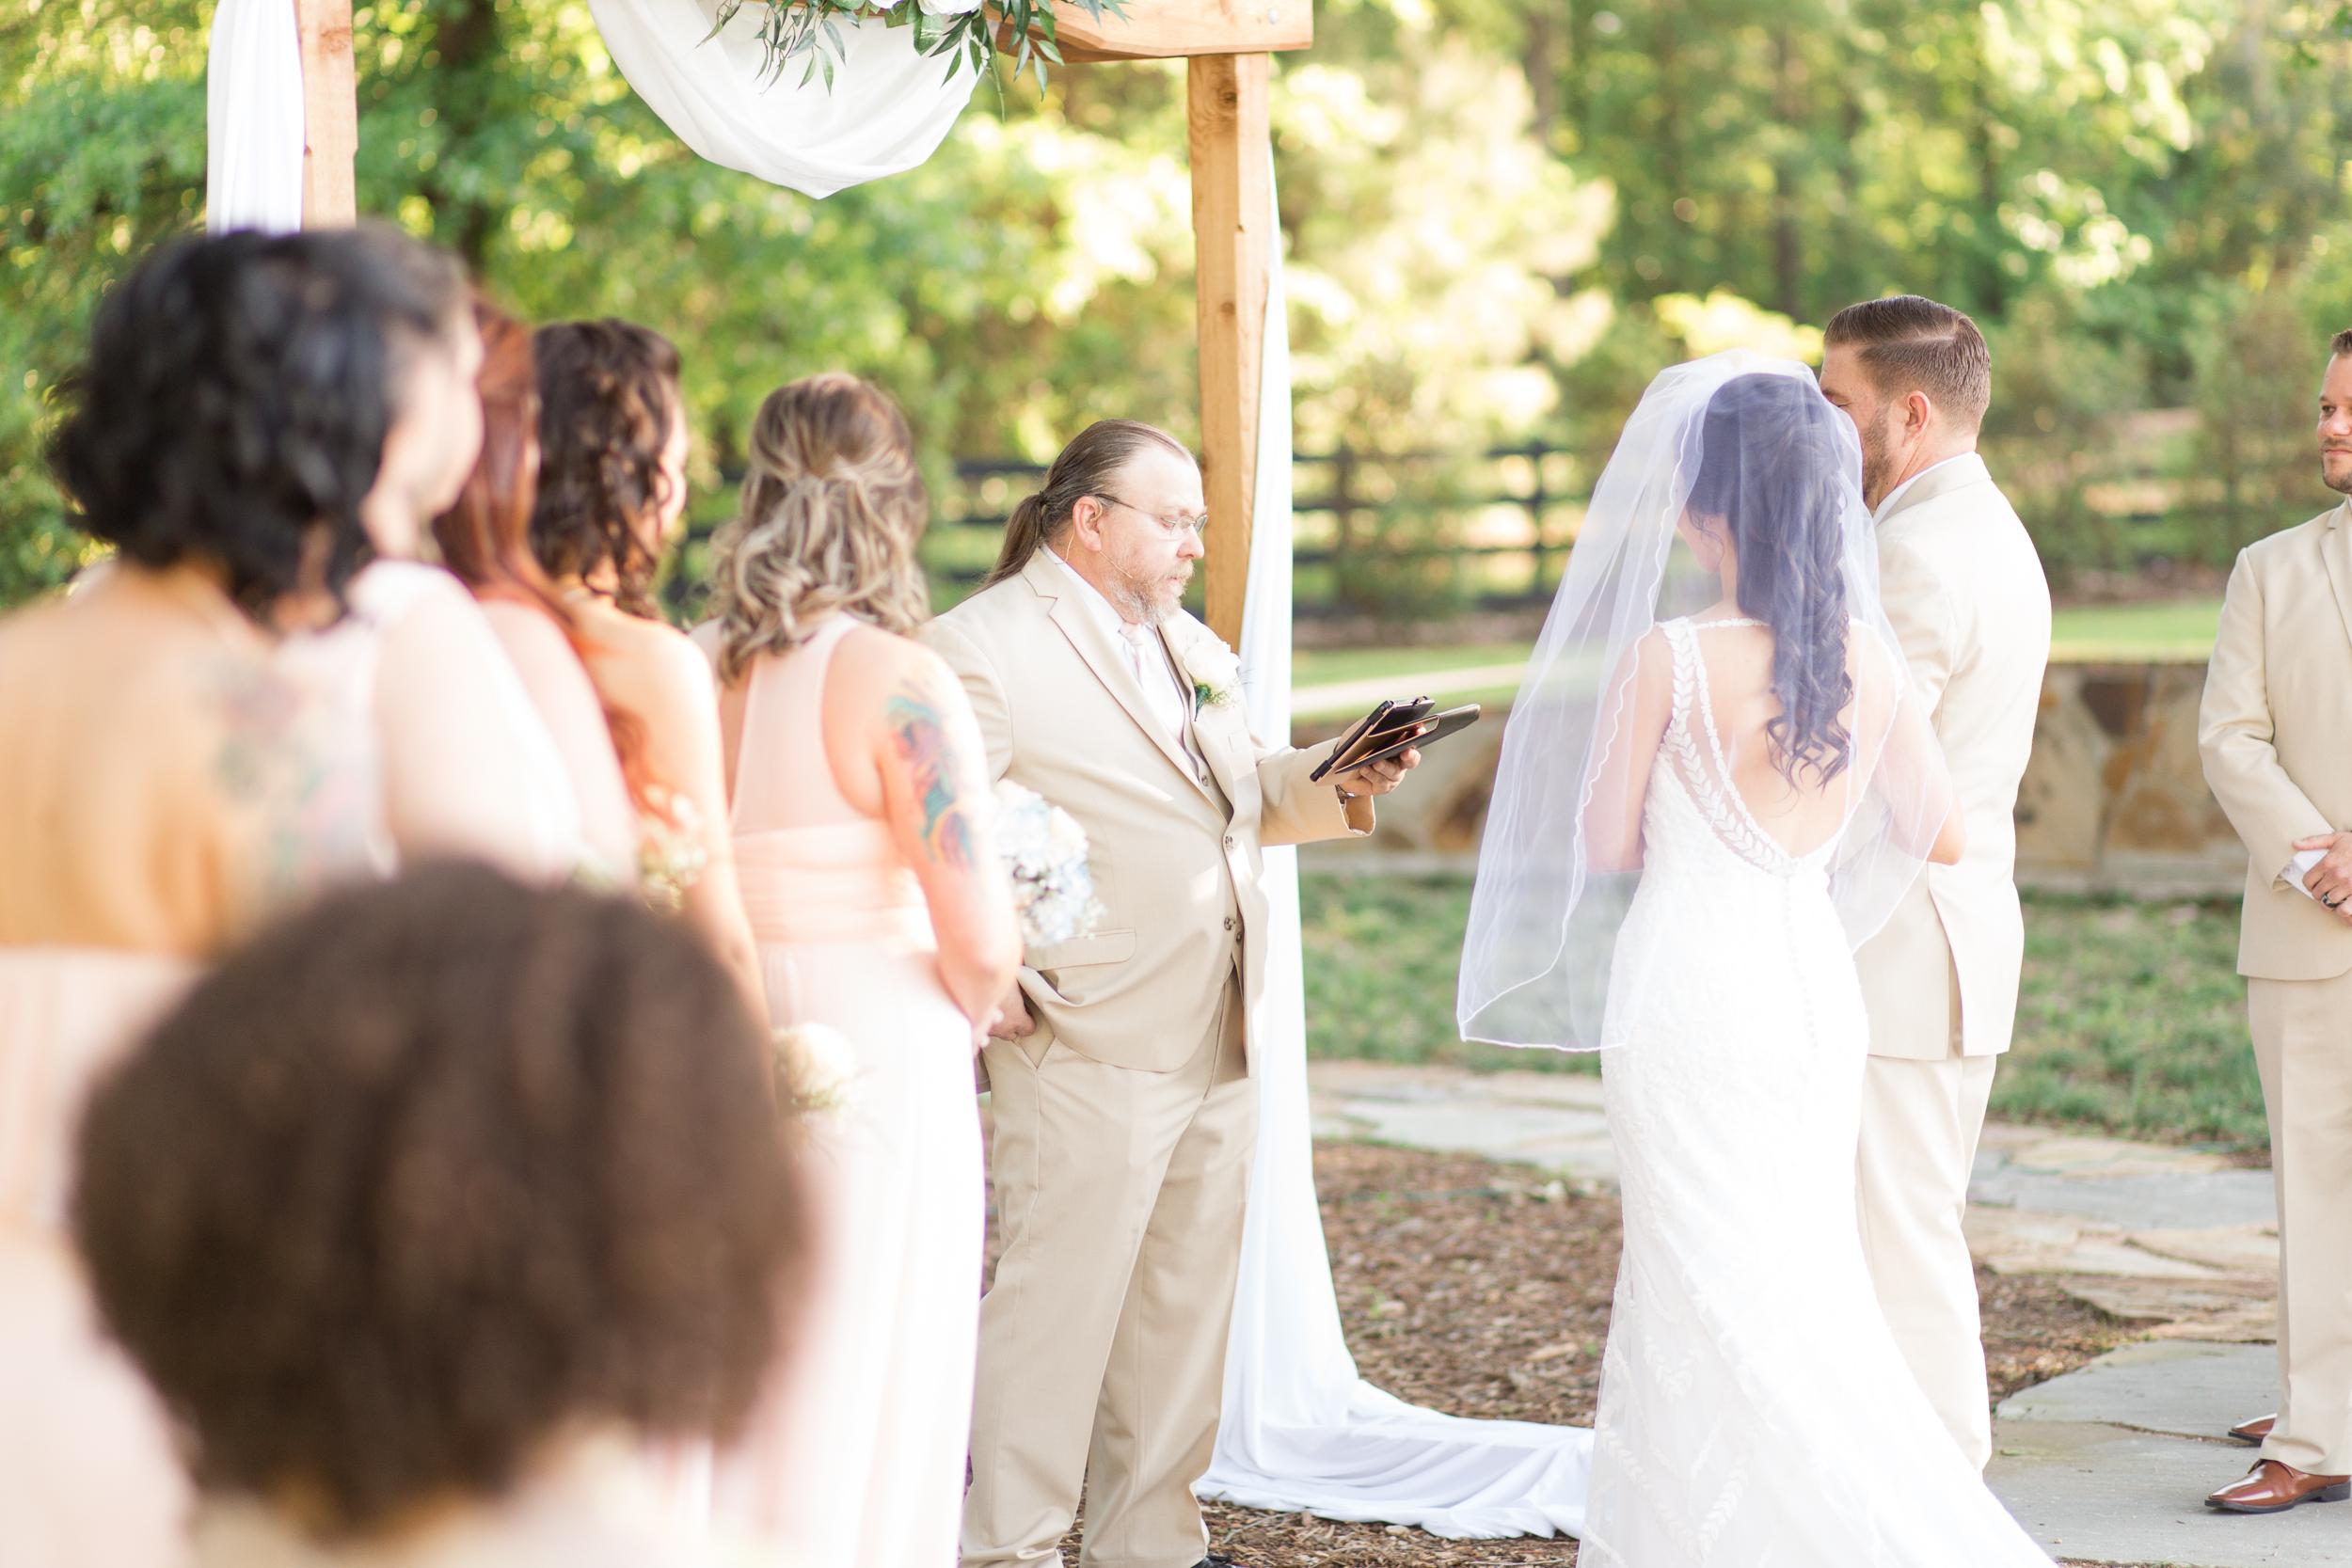 Zihlman-East TX Wedding_Kelsie Hendricks Photography_The Folmar Tyler Texas-102.jpg